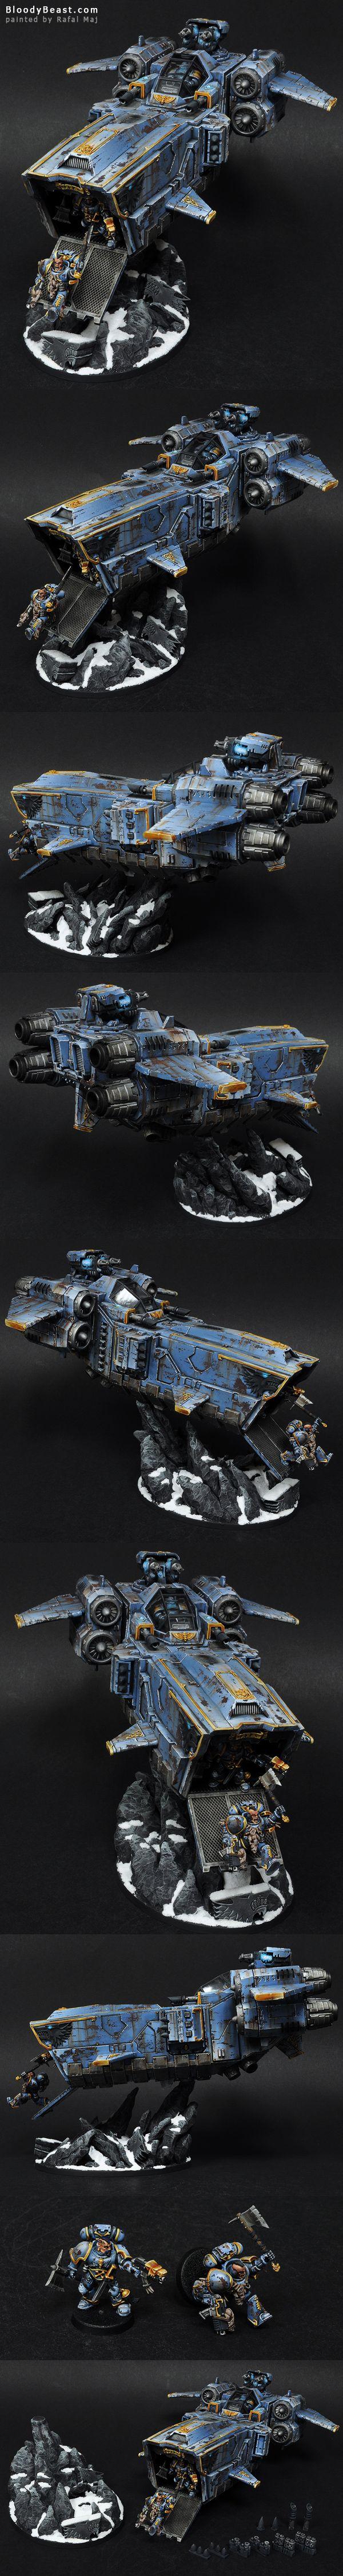 Space Wolves Stormwolf painted by Rafal Maj (BloodyBeast.com)